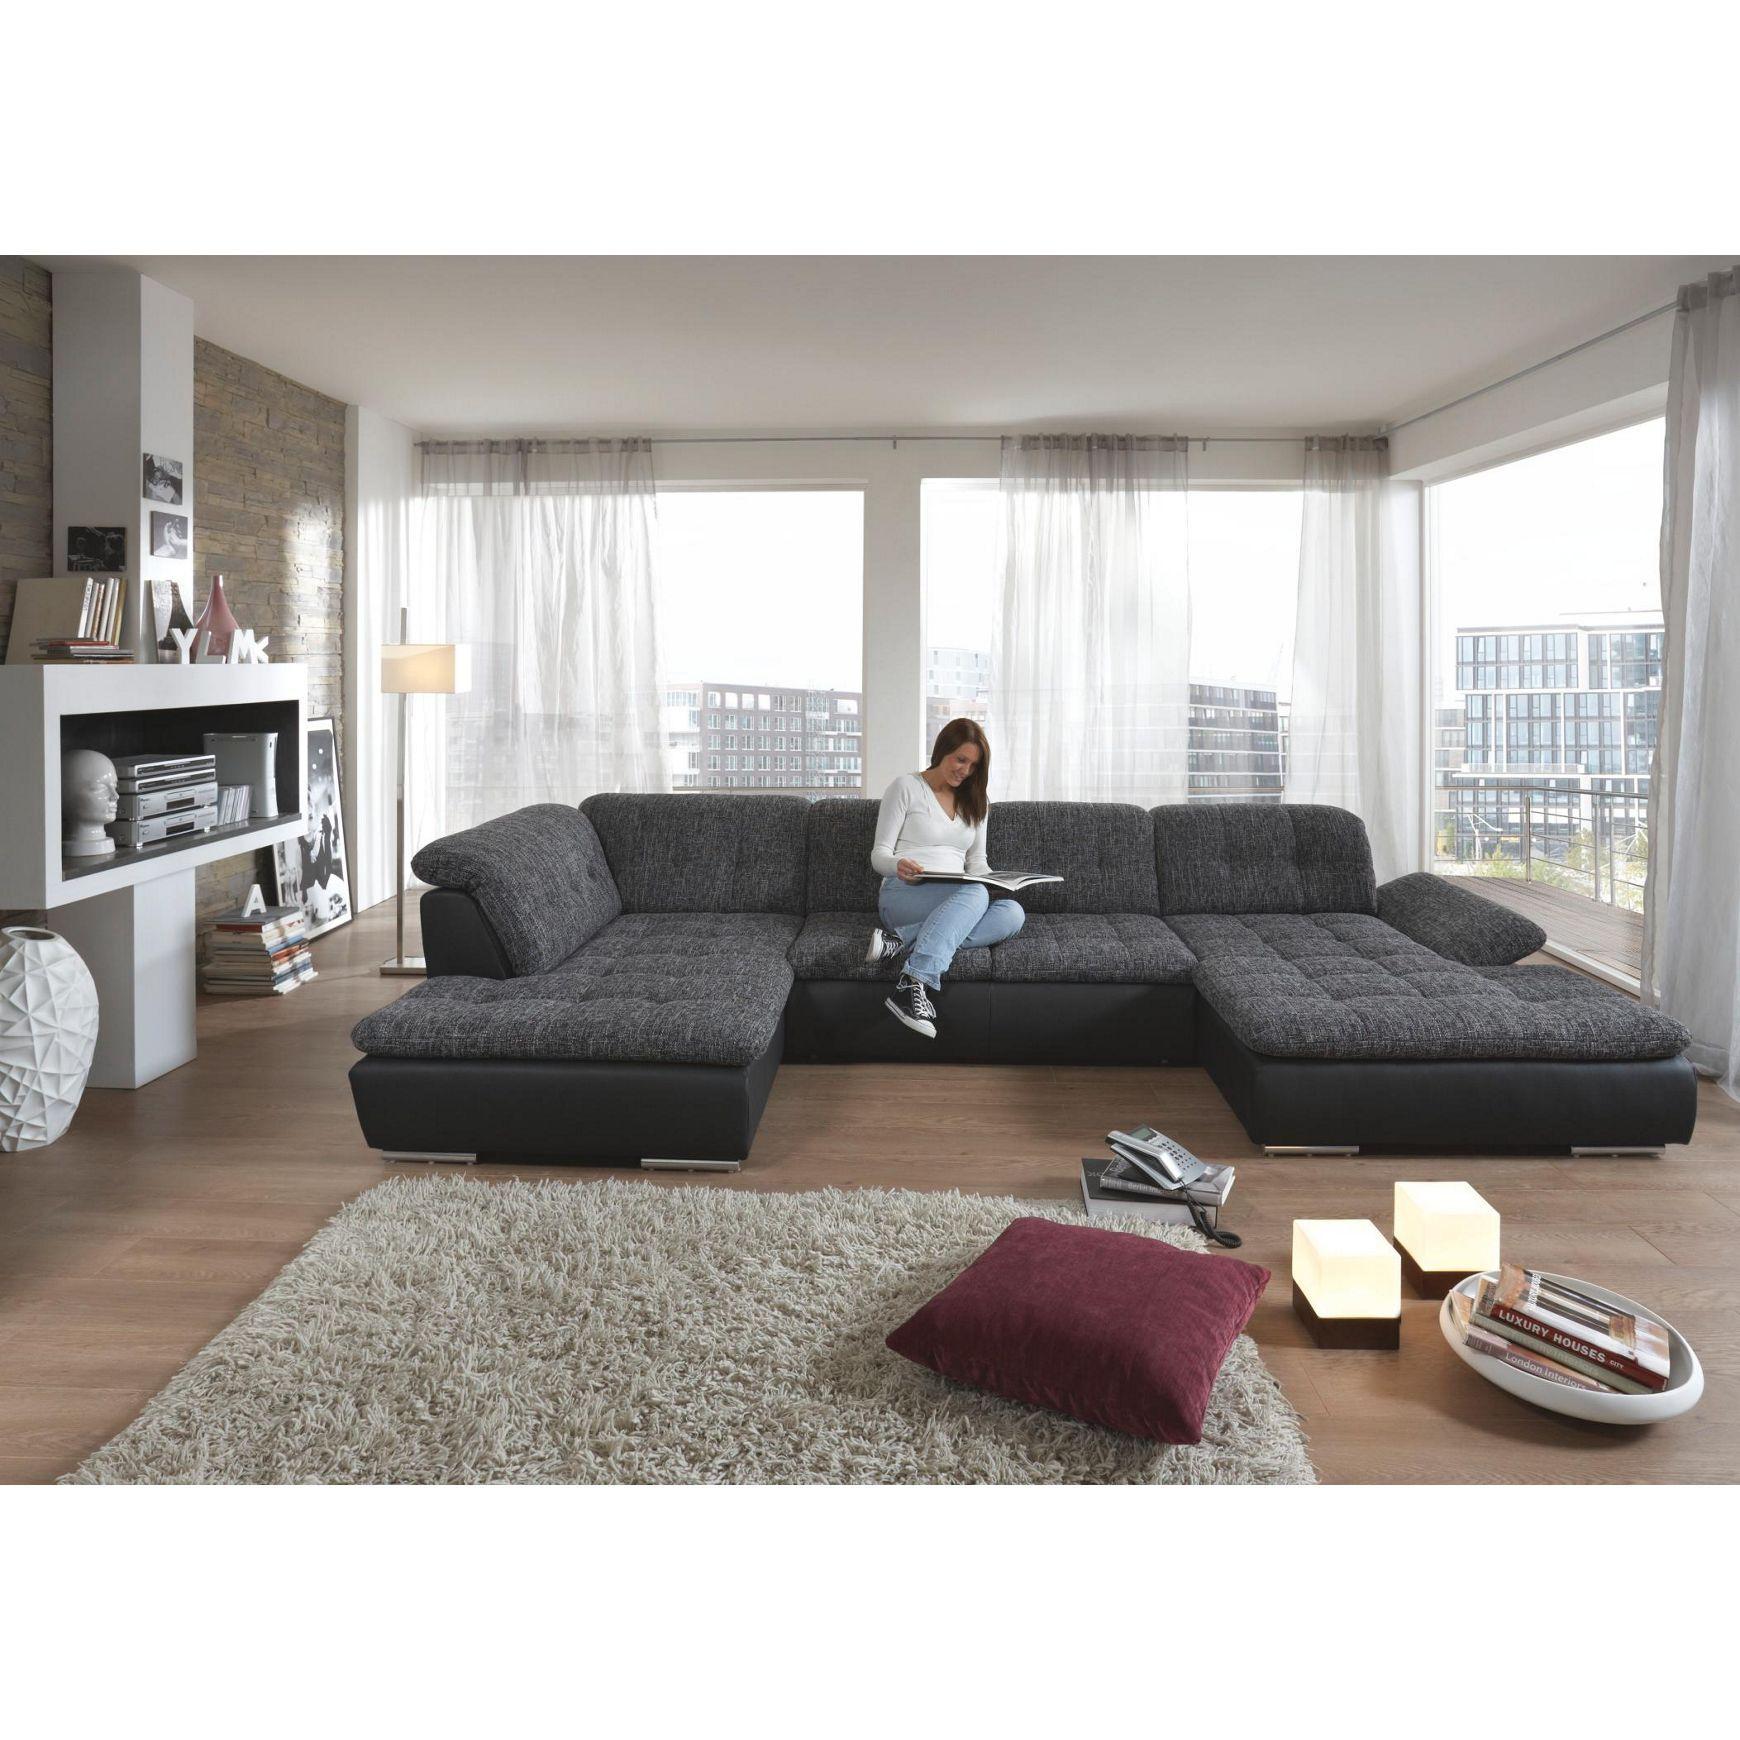 WOHNLANDSCHAFT In Grau Textil   Polstermöbel   Polstermöbel, Sofas U0026 Sessel    Wohn  U0026